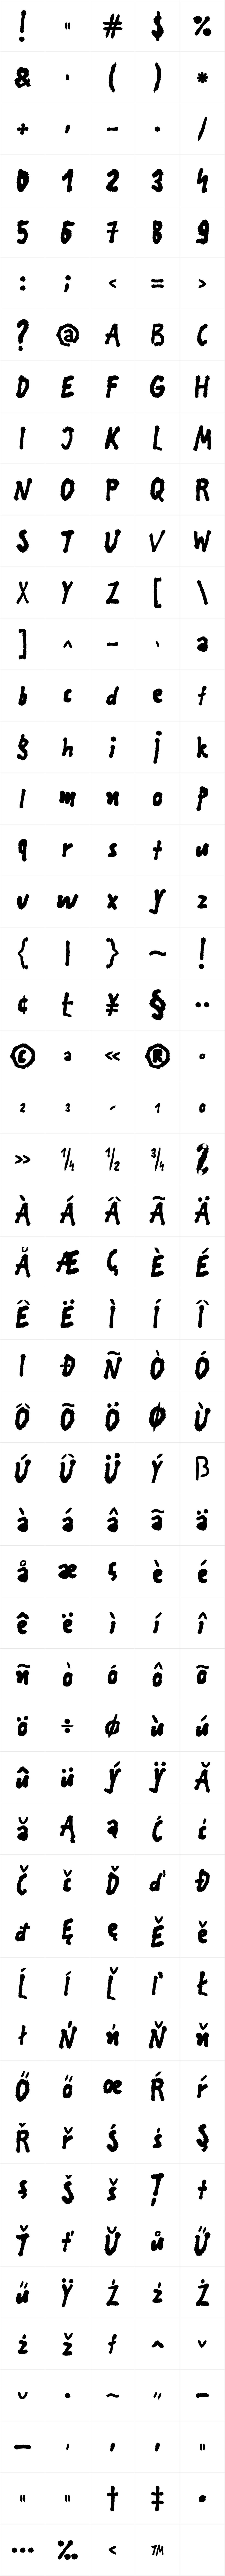 WIECZOREK script